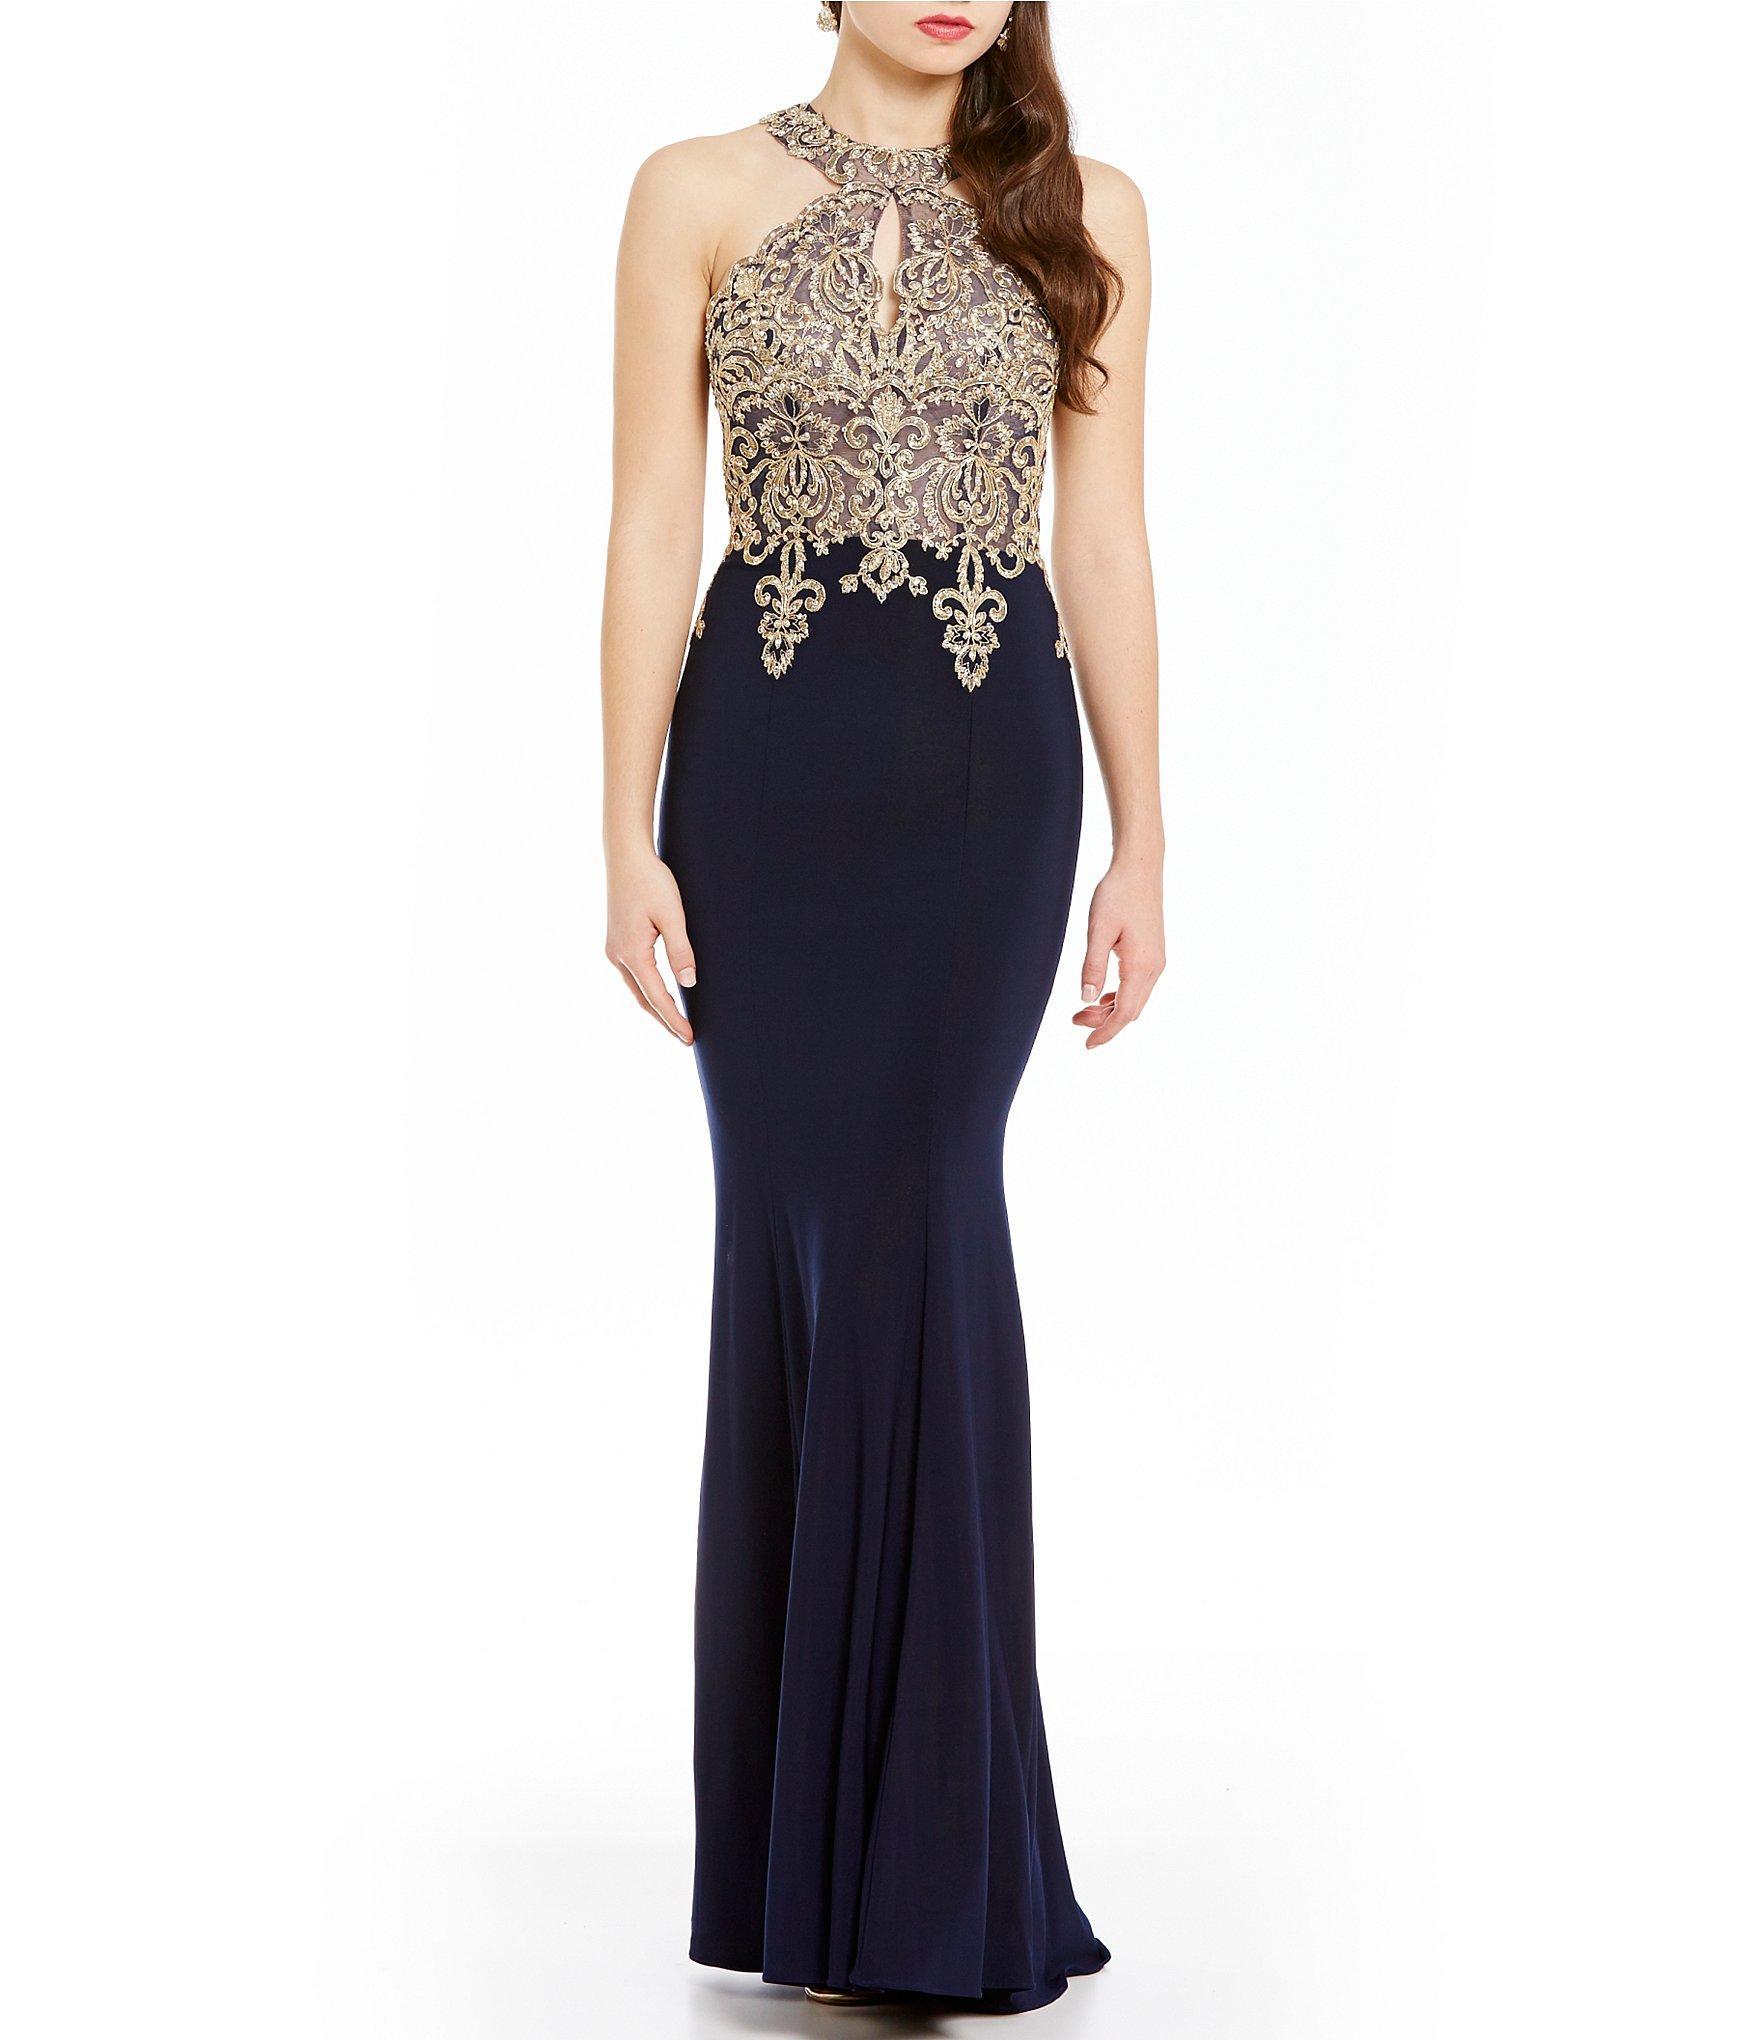 bad0e39af58 Xscape Gold Applique Halter Gown in Blue - Lyst